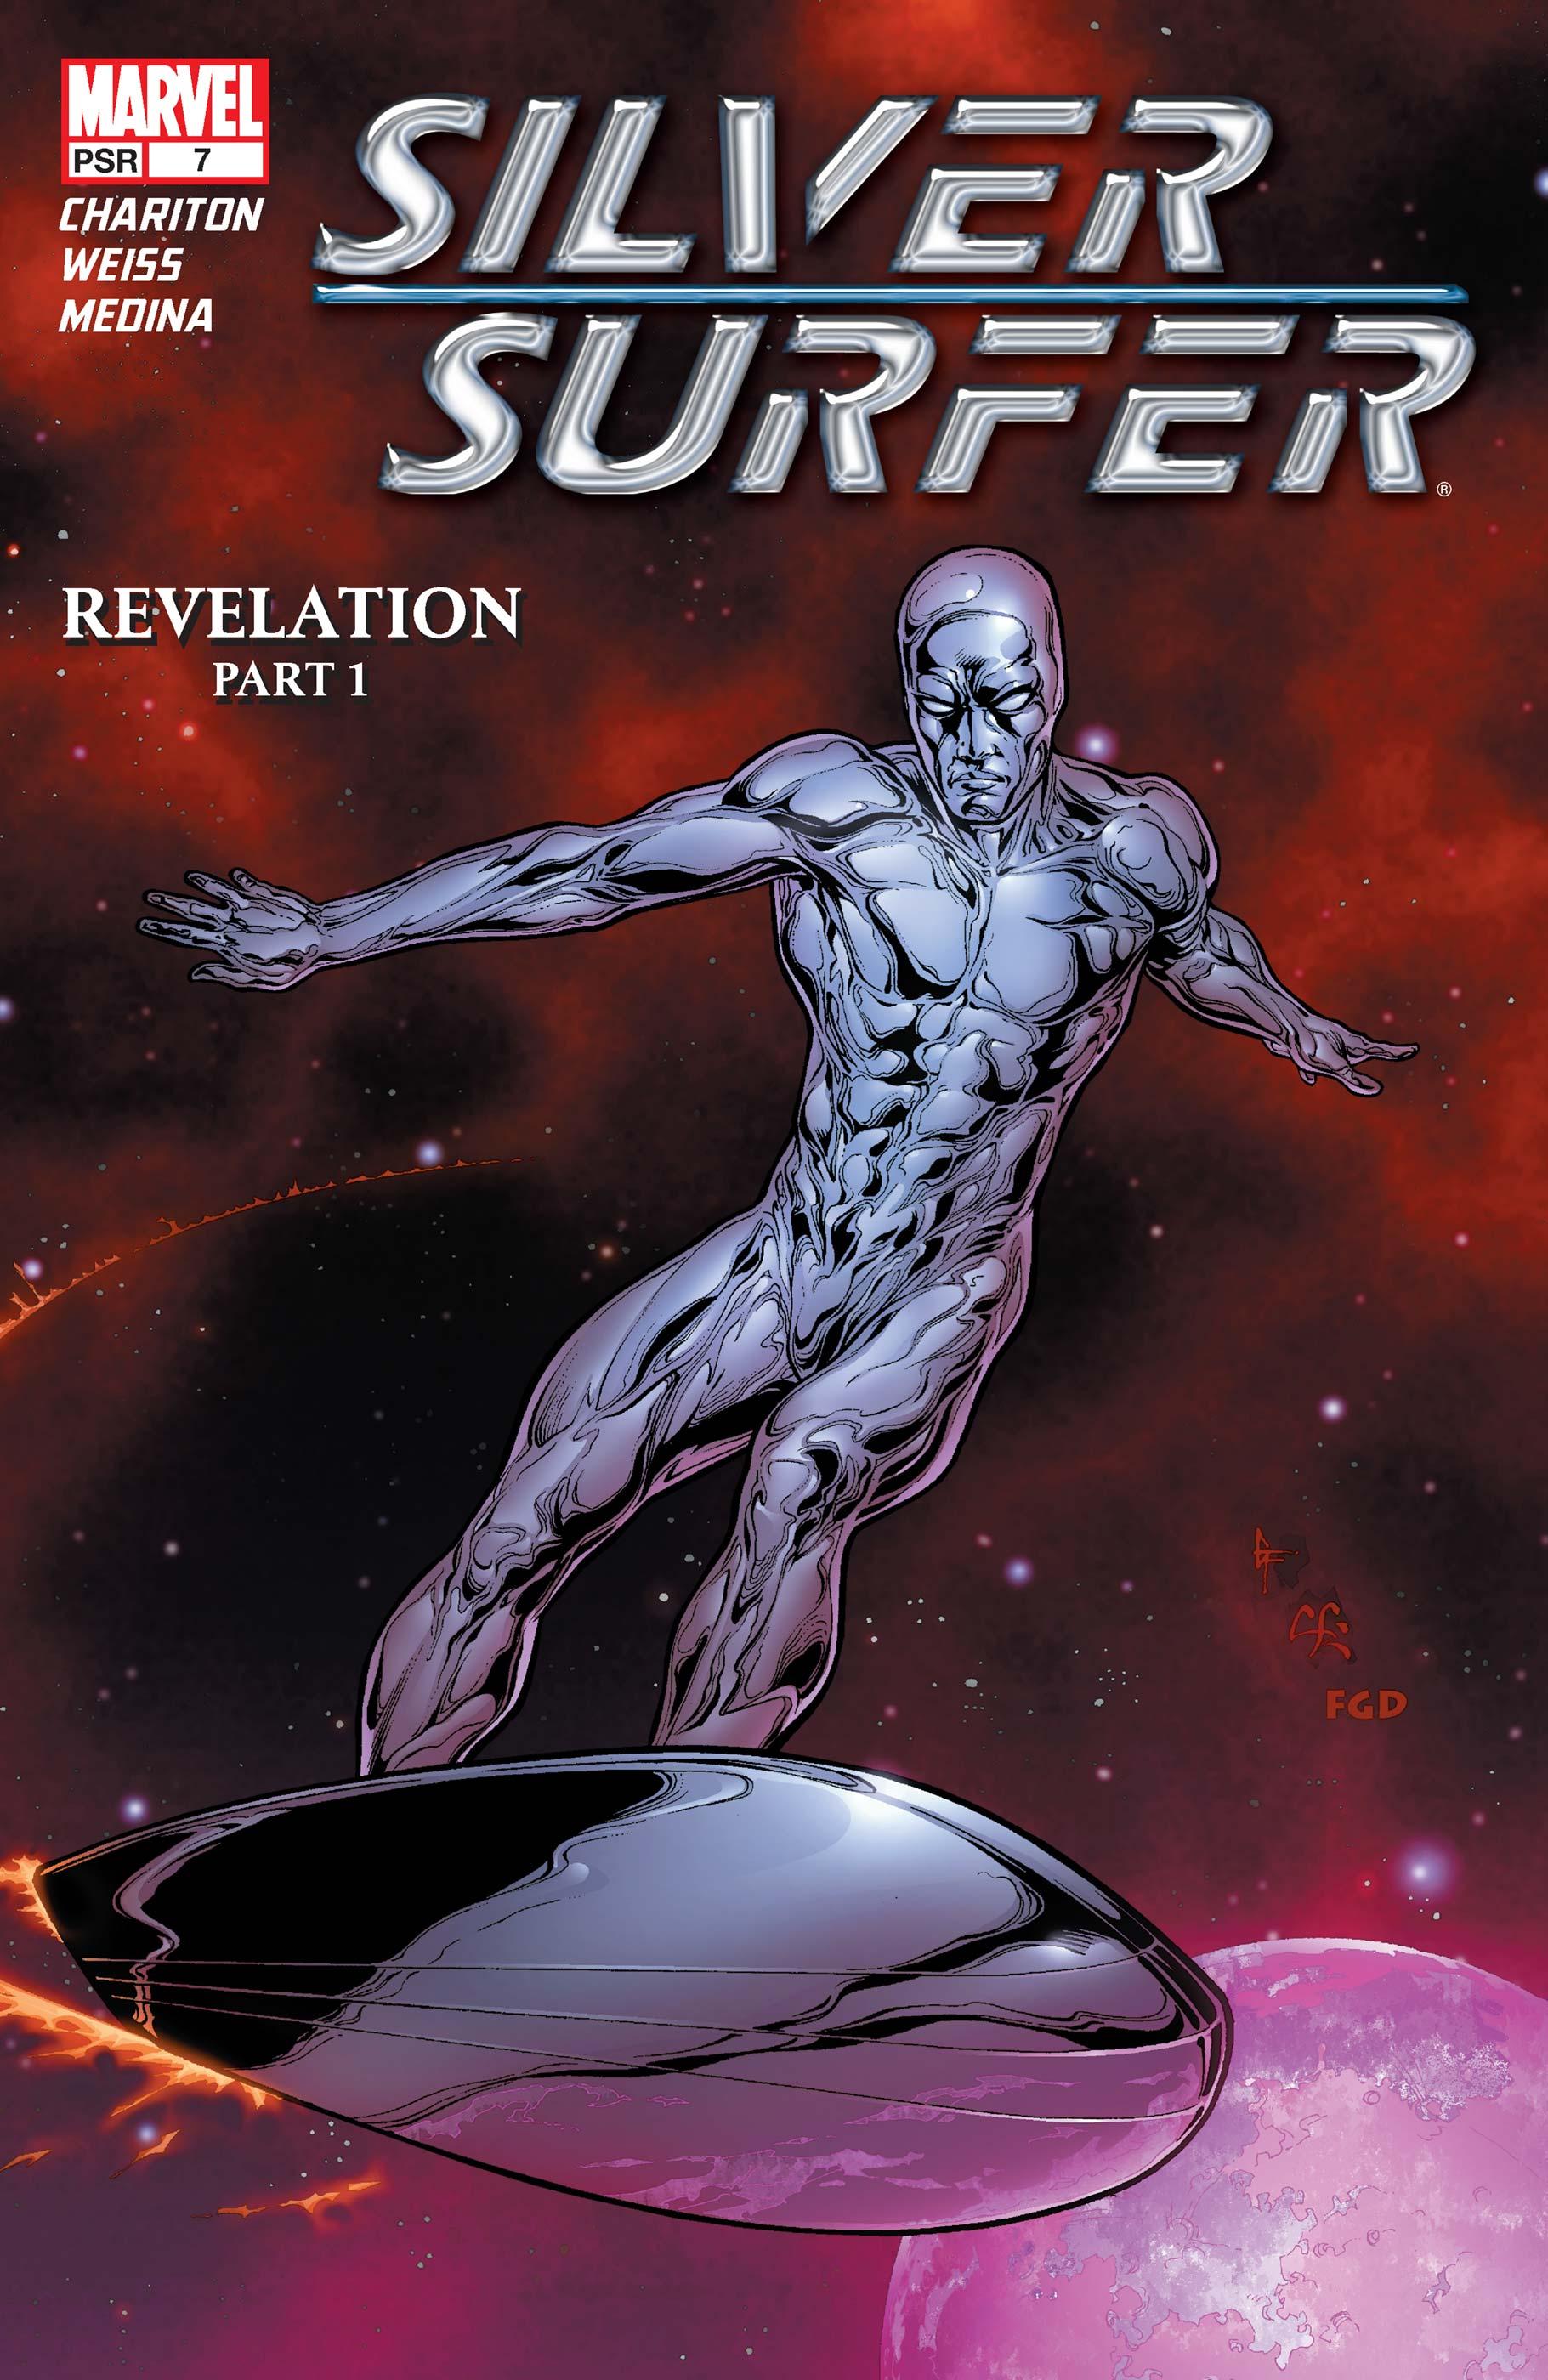 Silver Surfer (2003) #7